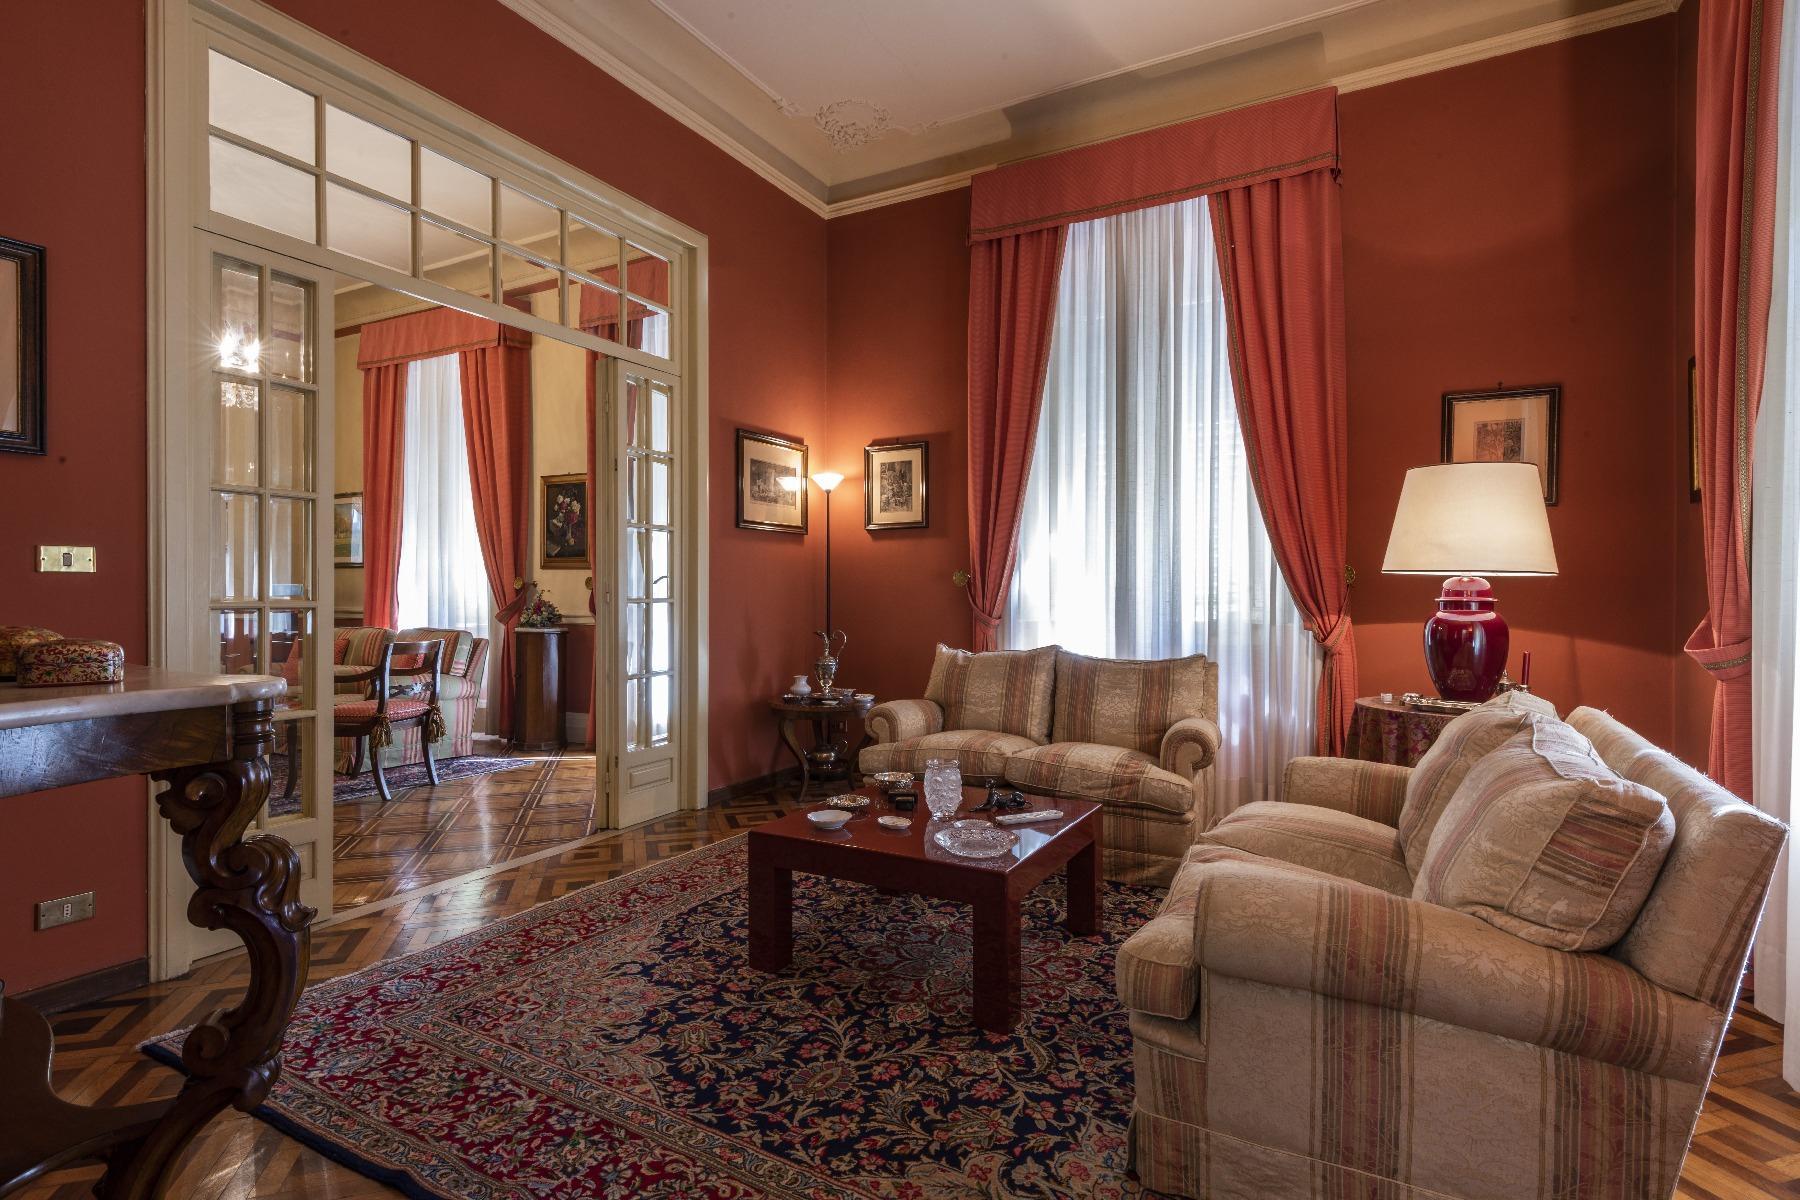 Extraordinary Liberty style villa - 4